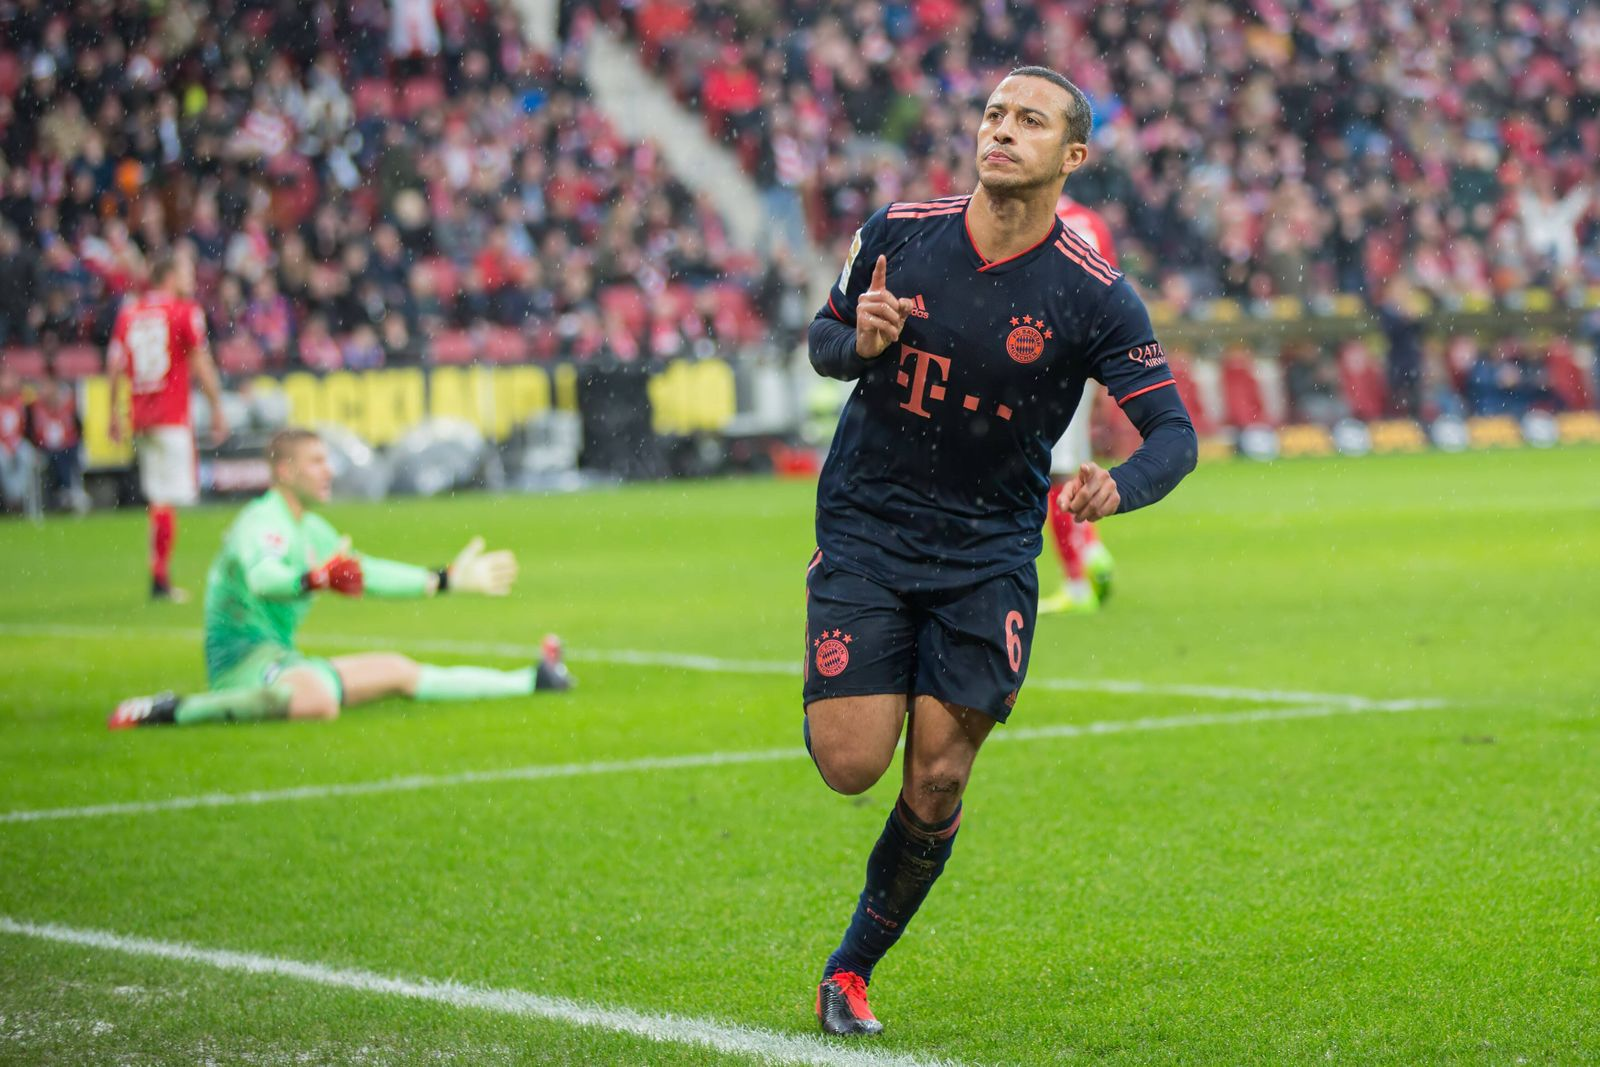 1. FSV Mainz 05 - FC Bayern Muenchen, 1. FBL Tor fuer Muenchen zum 0:3 durch Thiago (FC Bayern Muenchen, 6), der den am